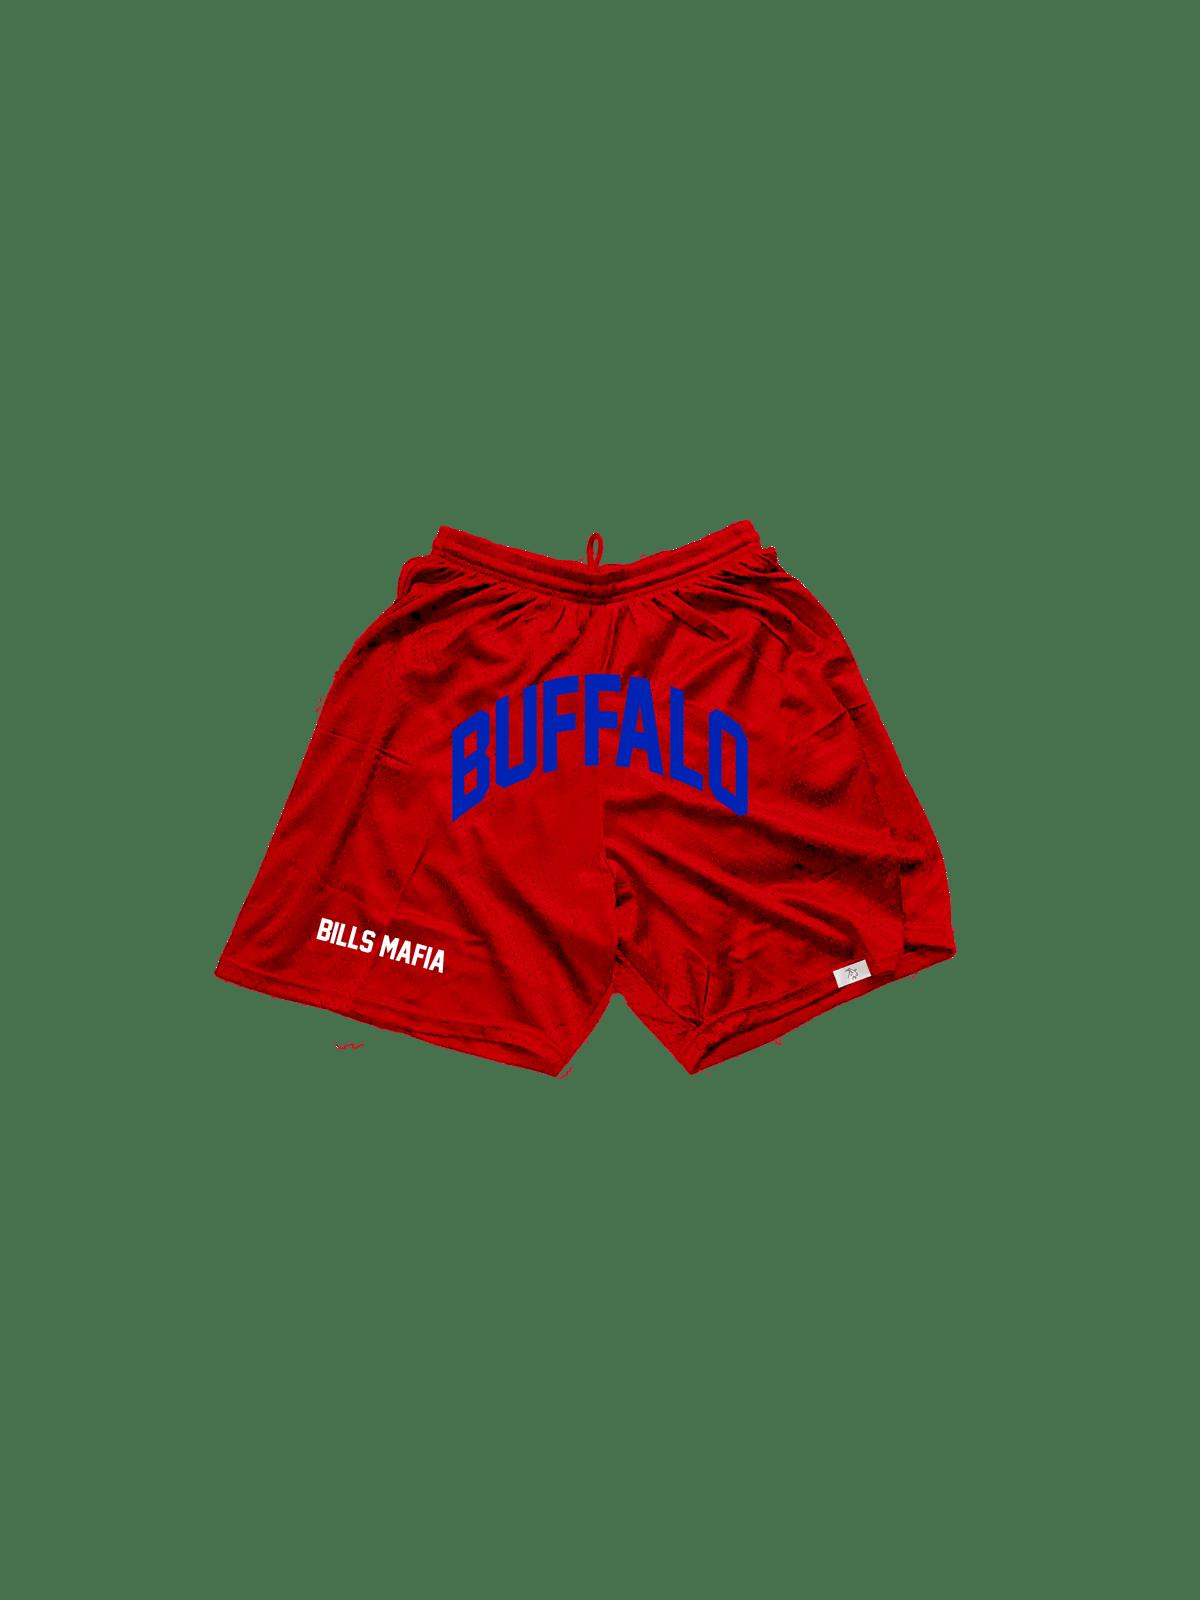 "Limited edition ""Bills Mafia"" Reverse colorway shorts"